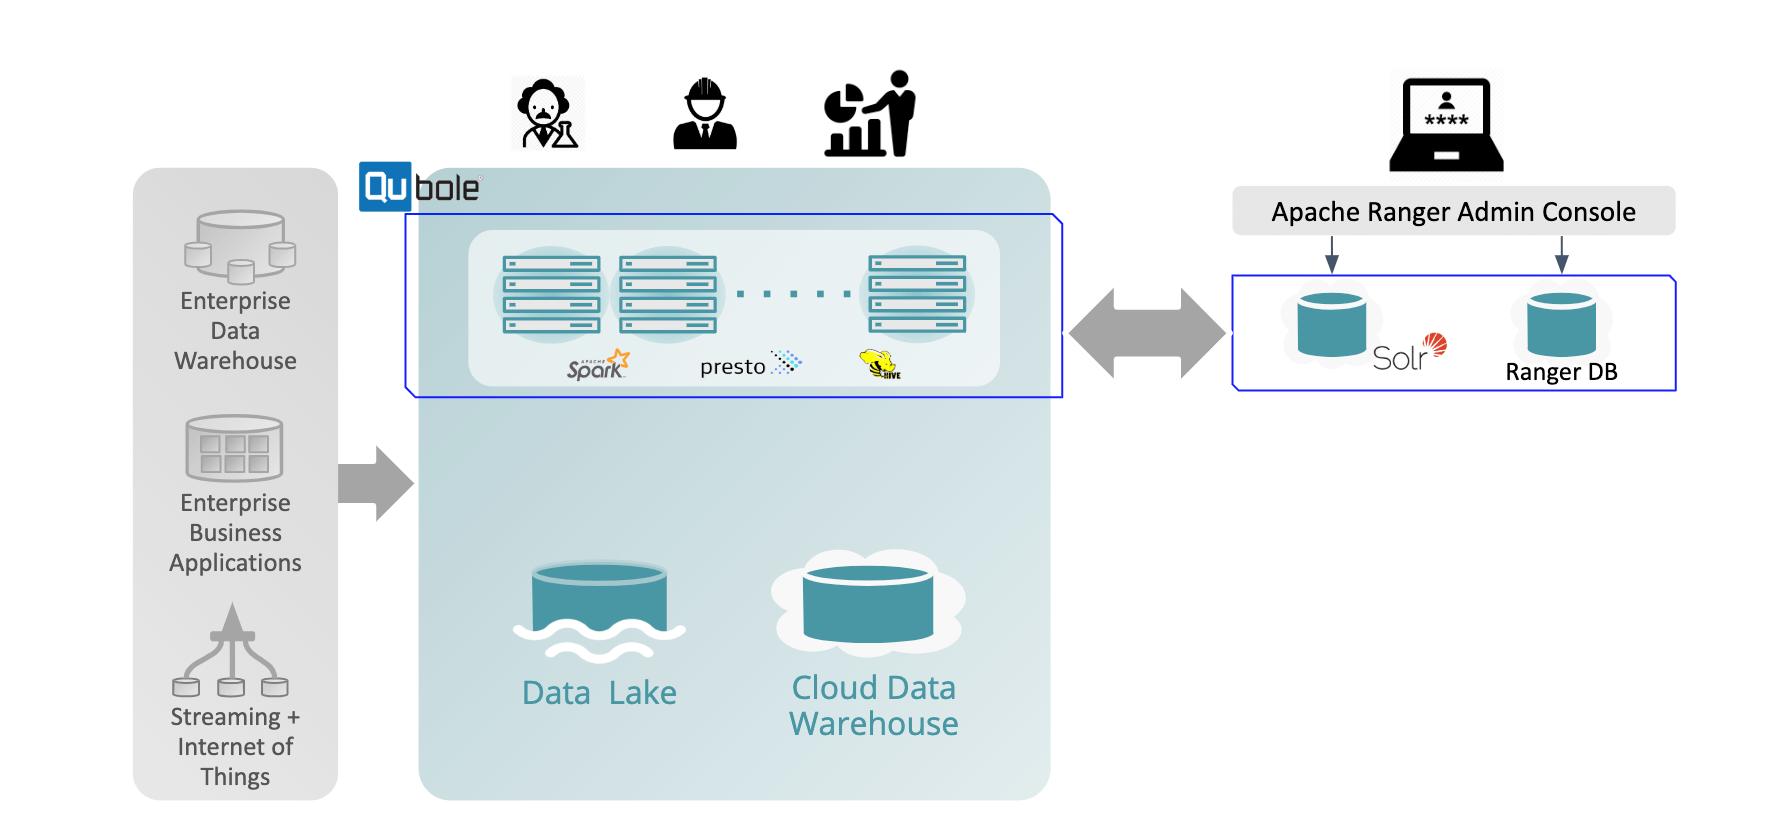 Data Lake Physical Storage Image 2